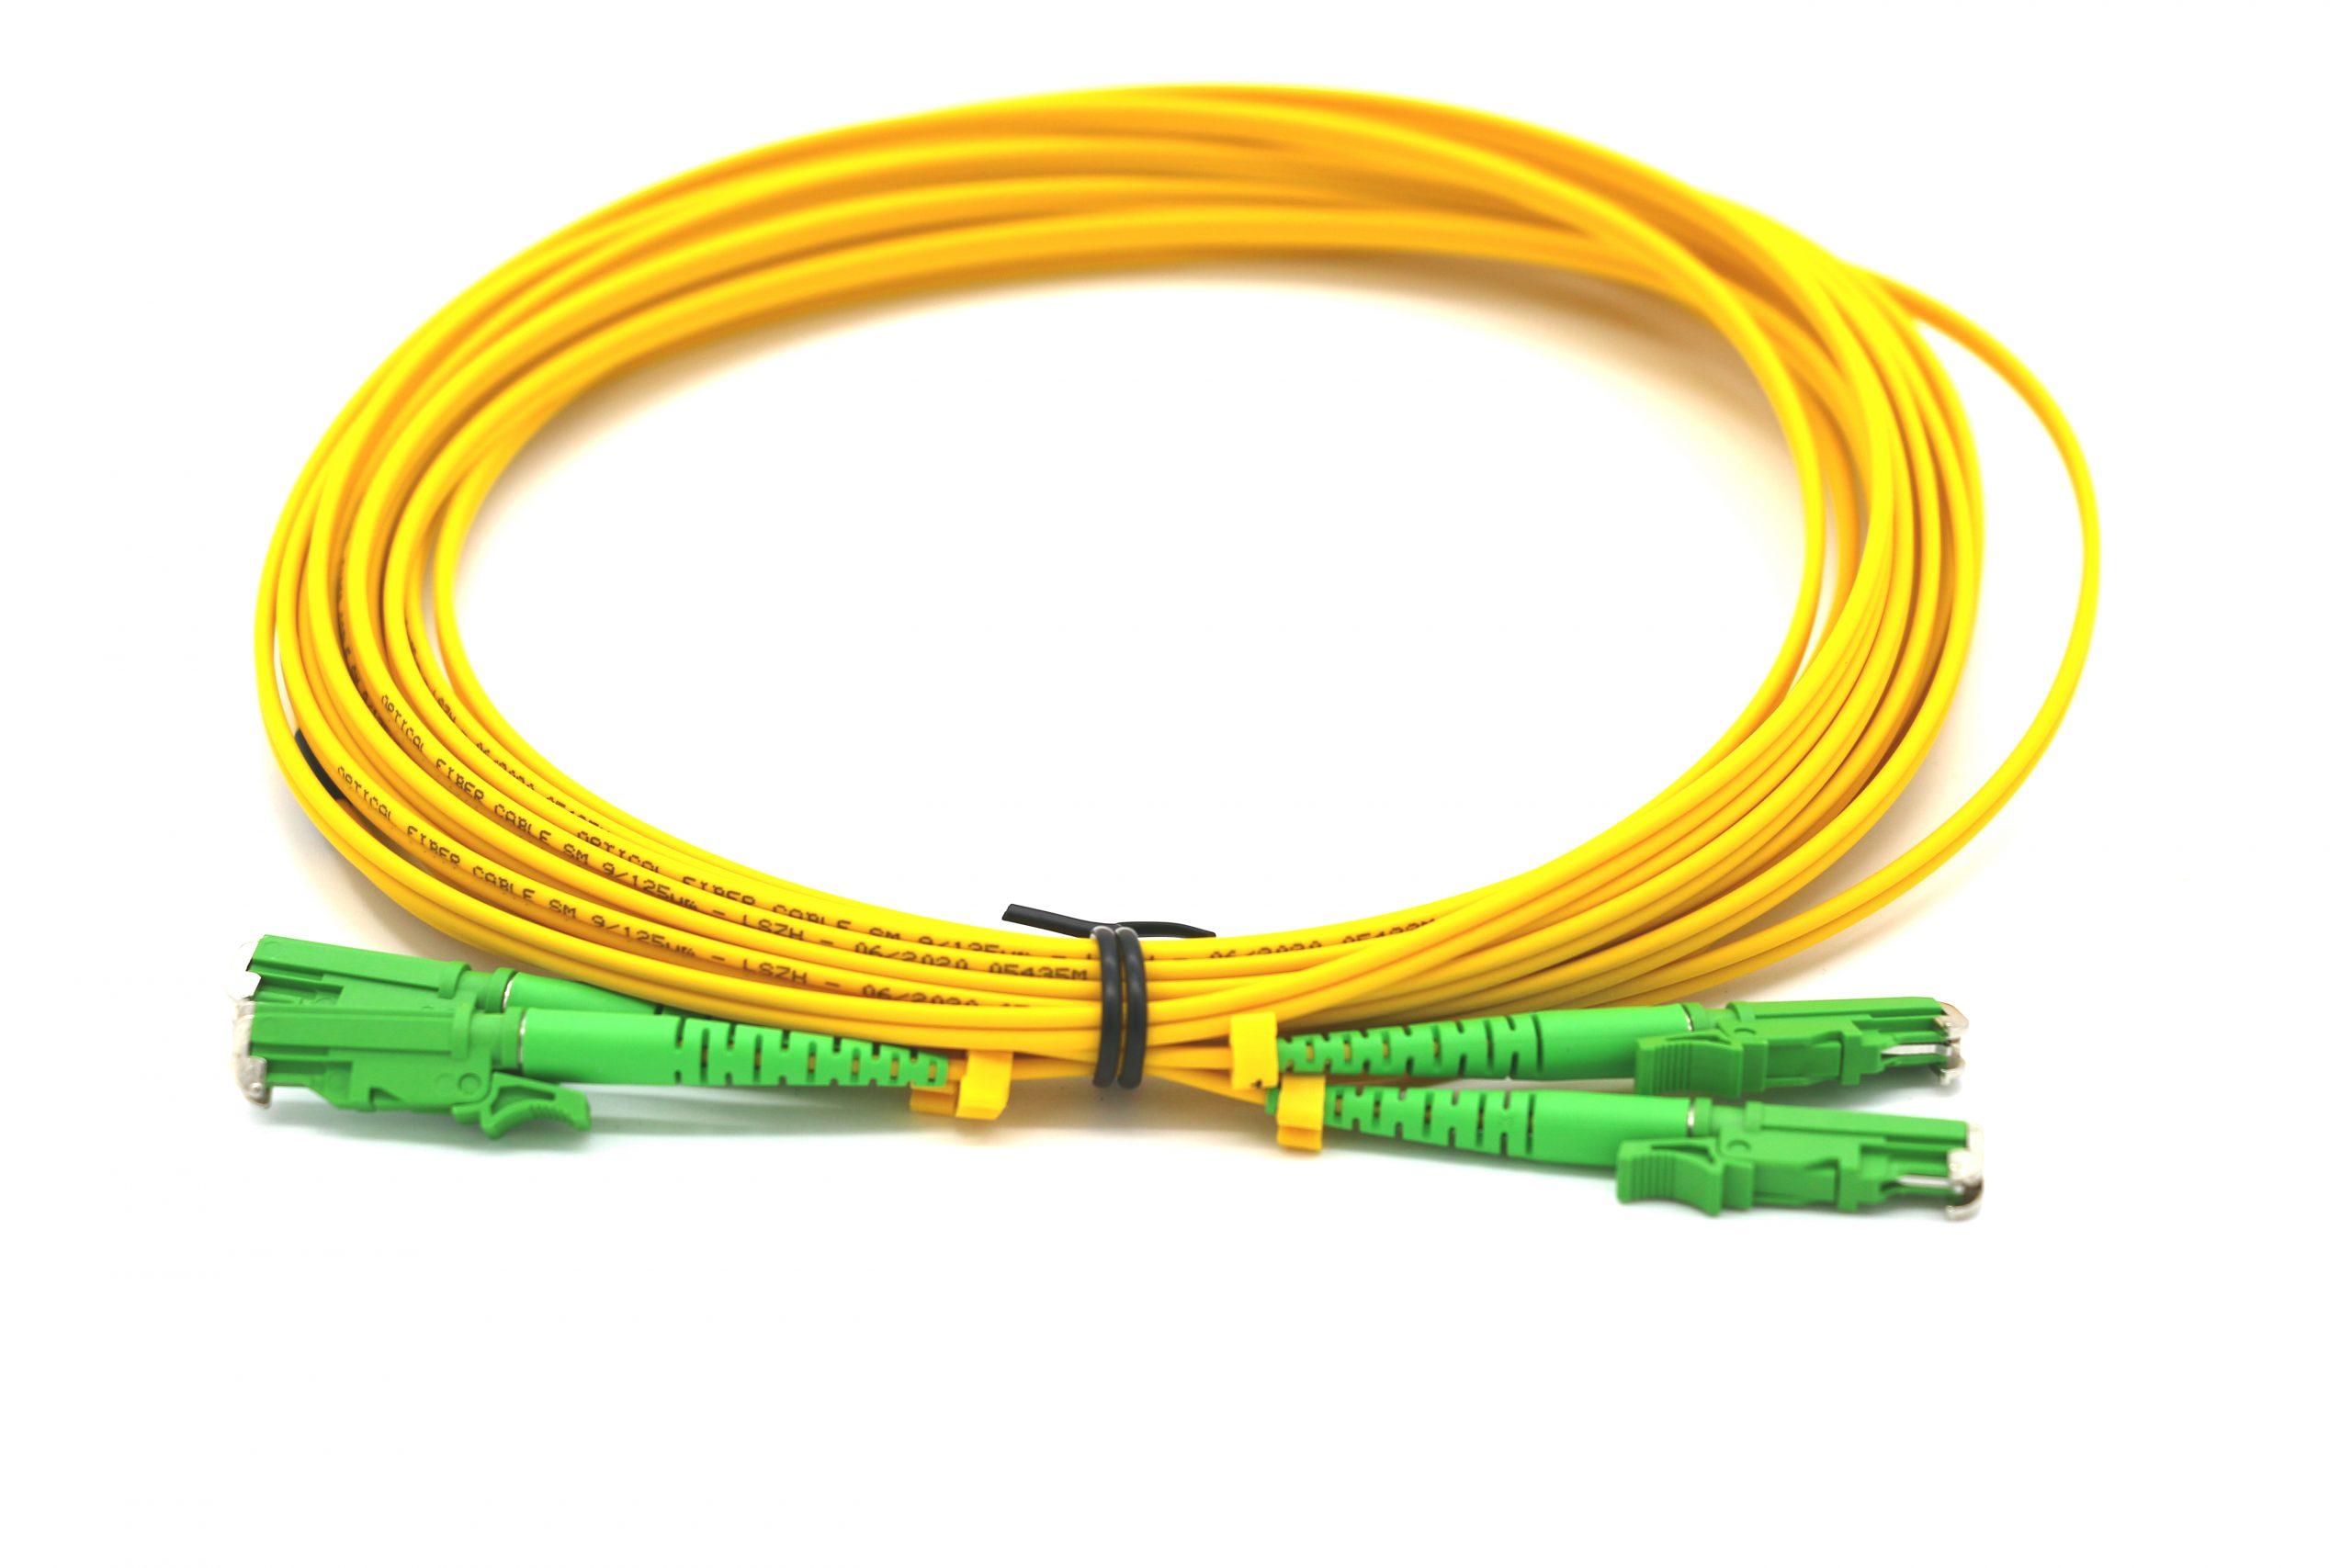 eLan E2000/APC-E2000/APC duplex patch cord OS2, 15m